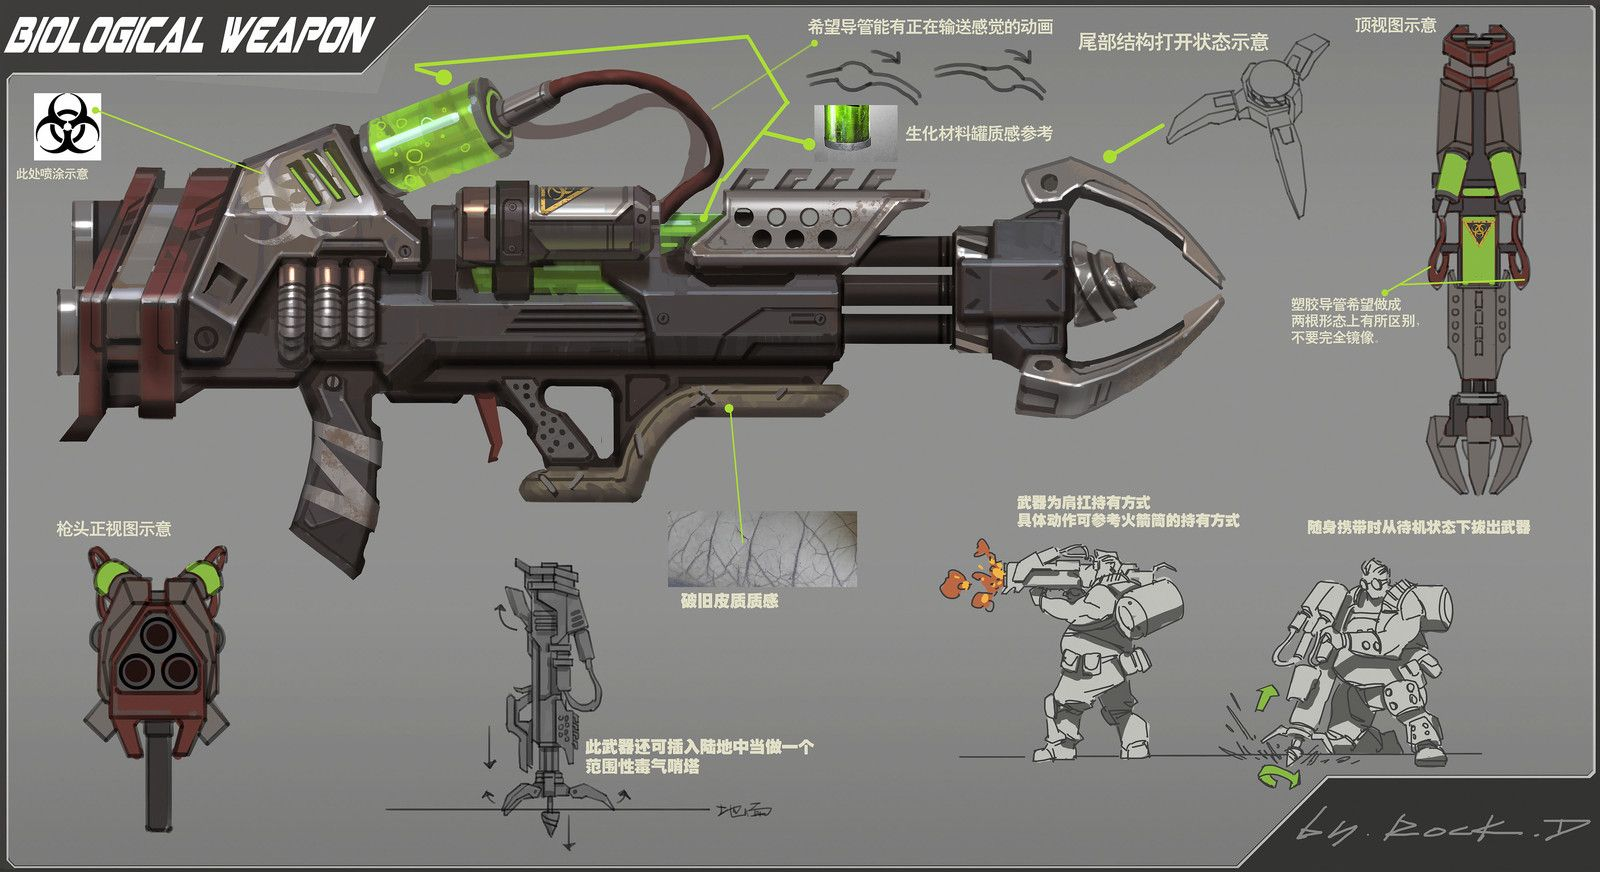 Biological weapon concept, Rock D on ArtStation at https://www.artstation.com/artwork/biological-weapon-concept